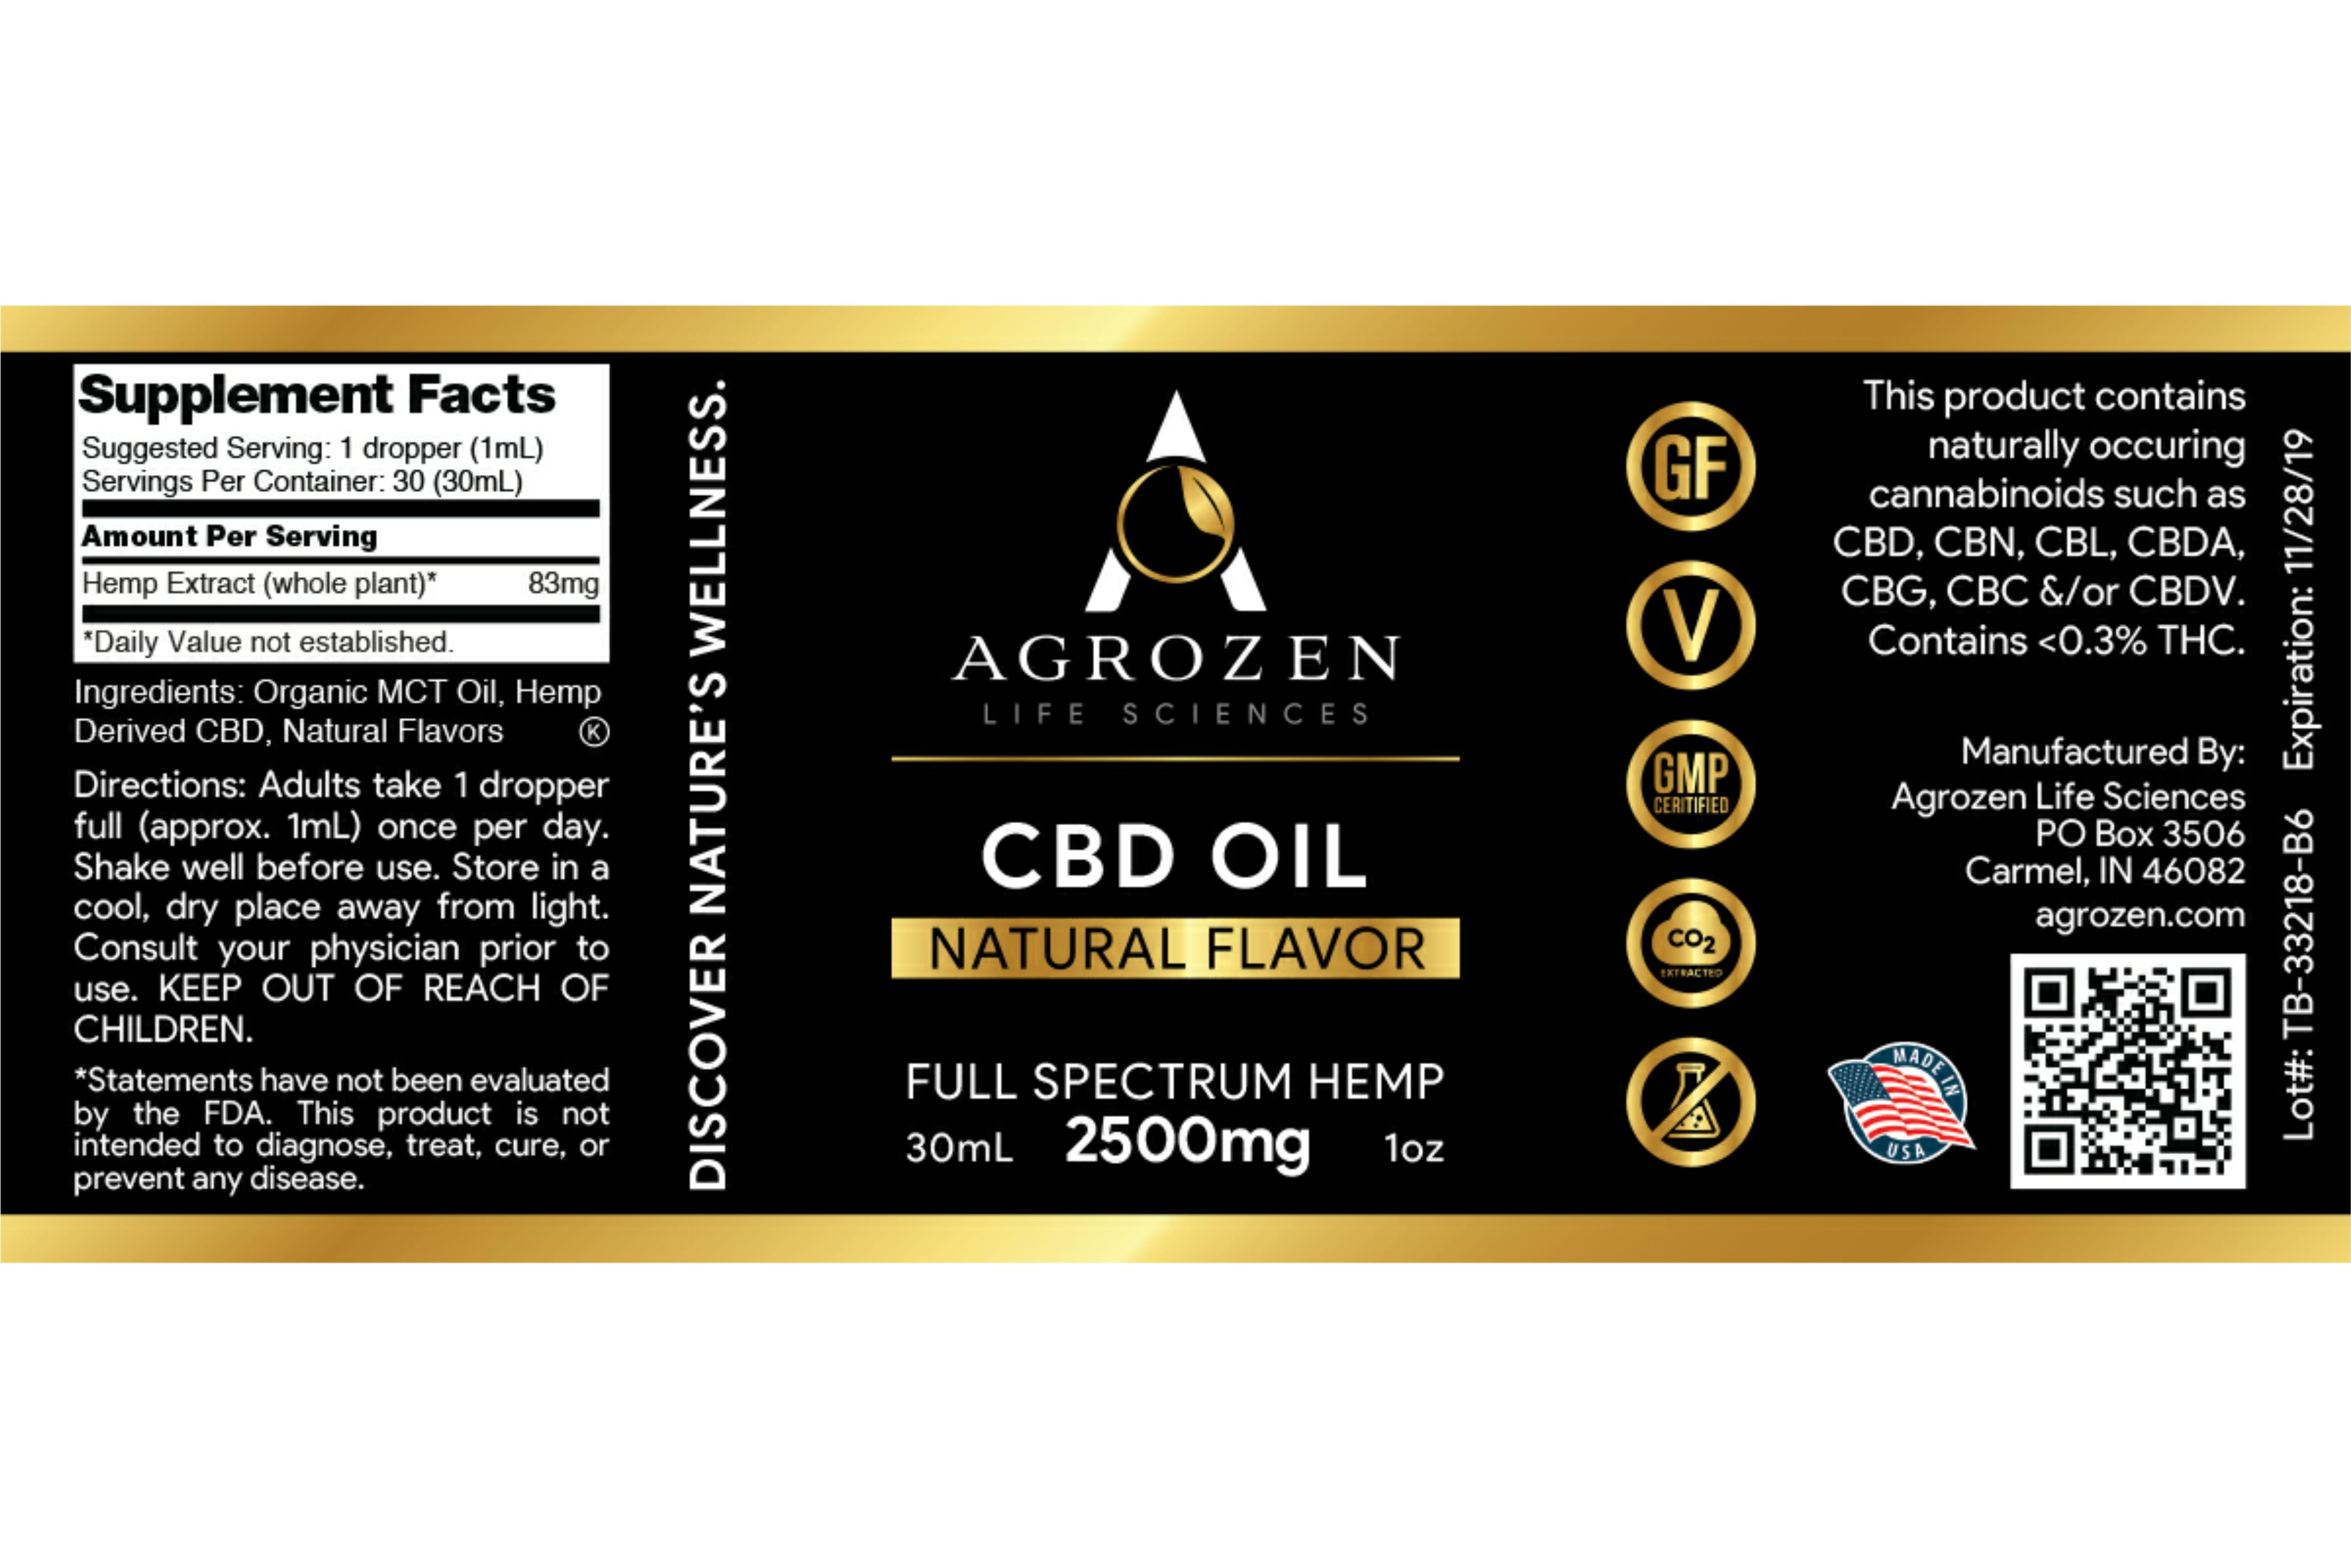 CBD Tincture Oil - 2500mg Full Spectrum Hemp Extract, Natural Flavor